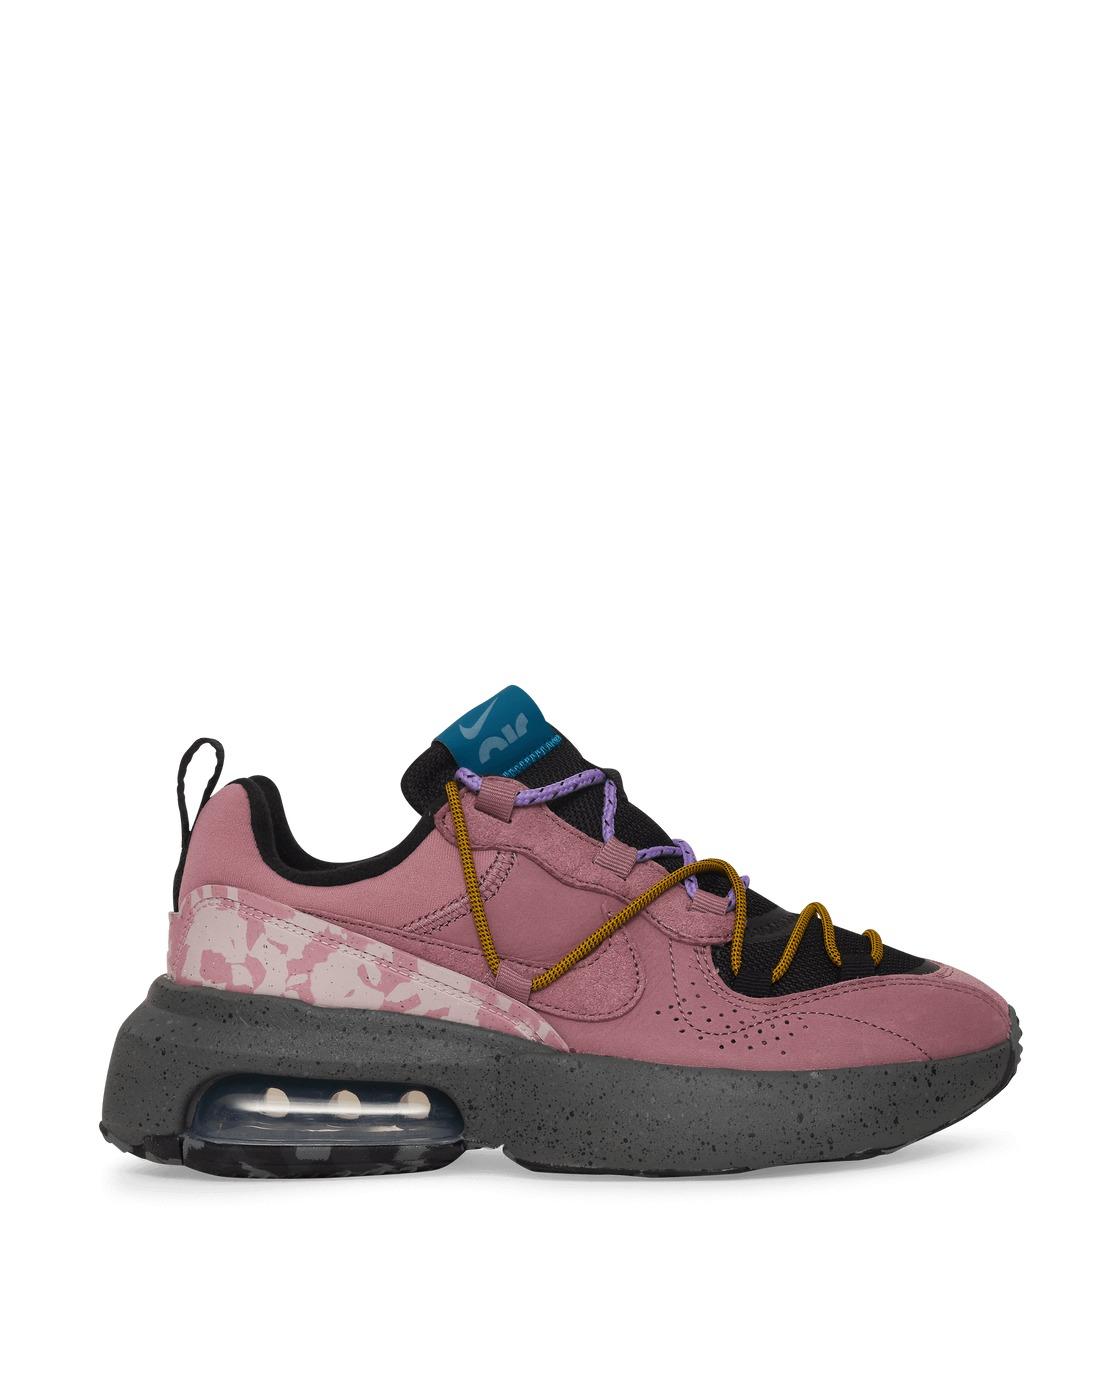 Photo: Nike Air Max Verona 2.0 Sneakers Black/Plum Dust